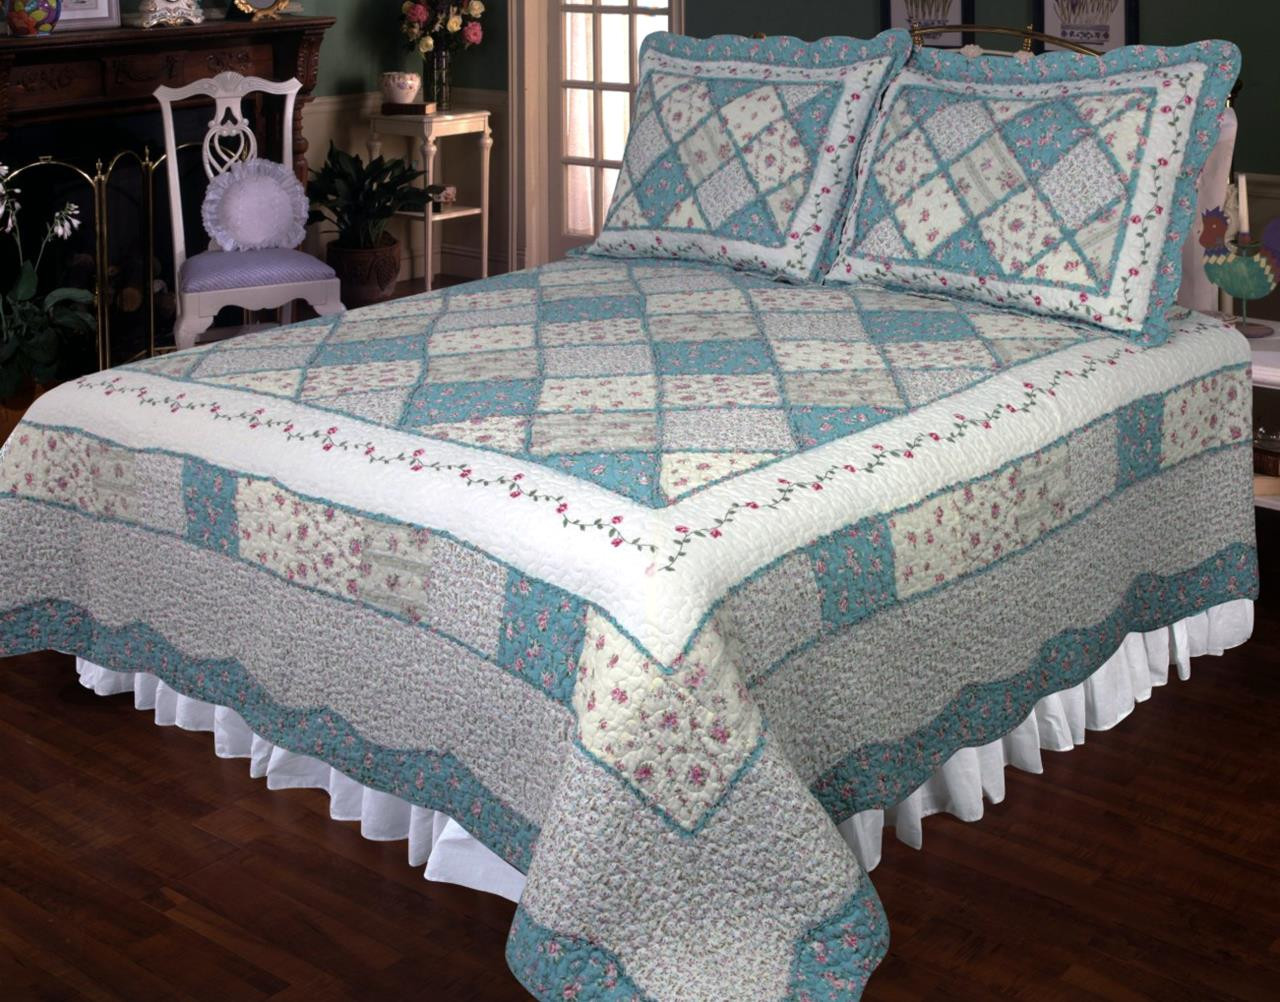 Ashley Blue Quilt By Elegant Decor Paul S Home Fashions